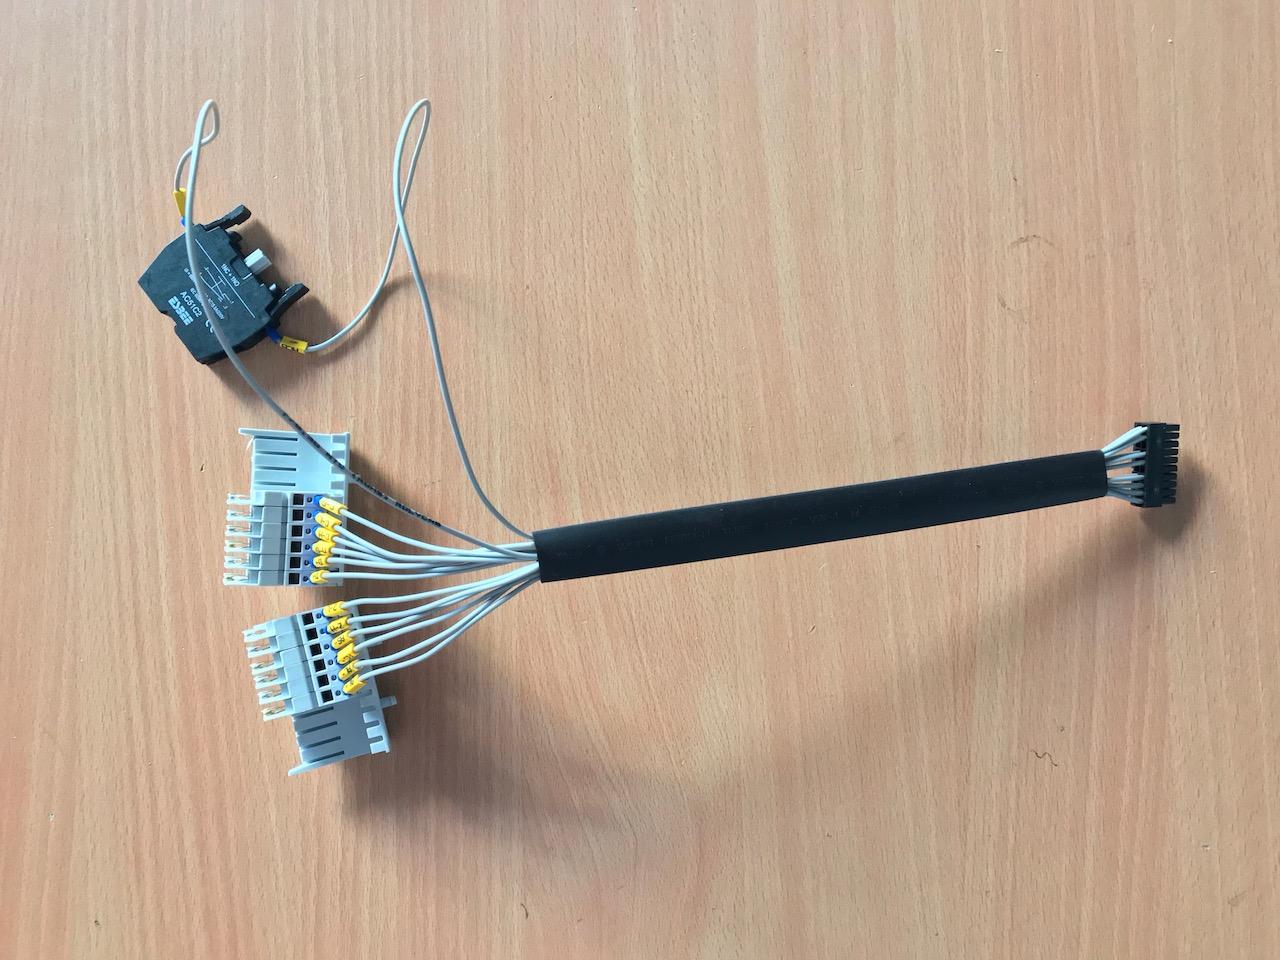 Wire Harness Manufacturers Sai Samarth Enterprises Electrical Wiring Accessories Img 6218